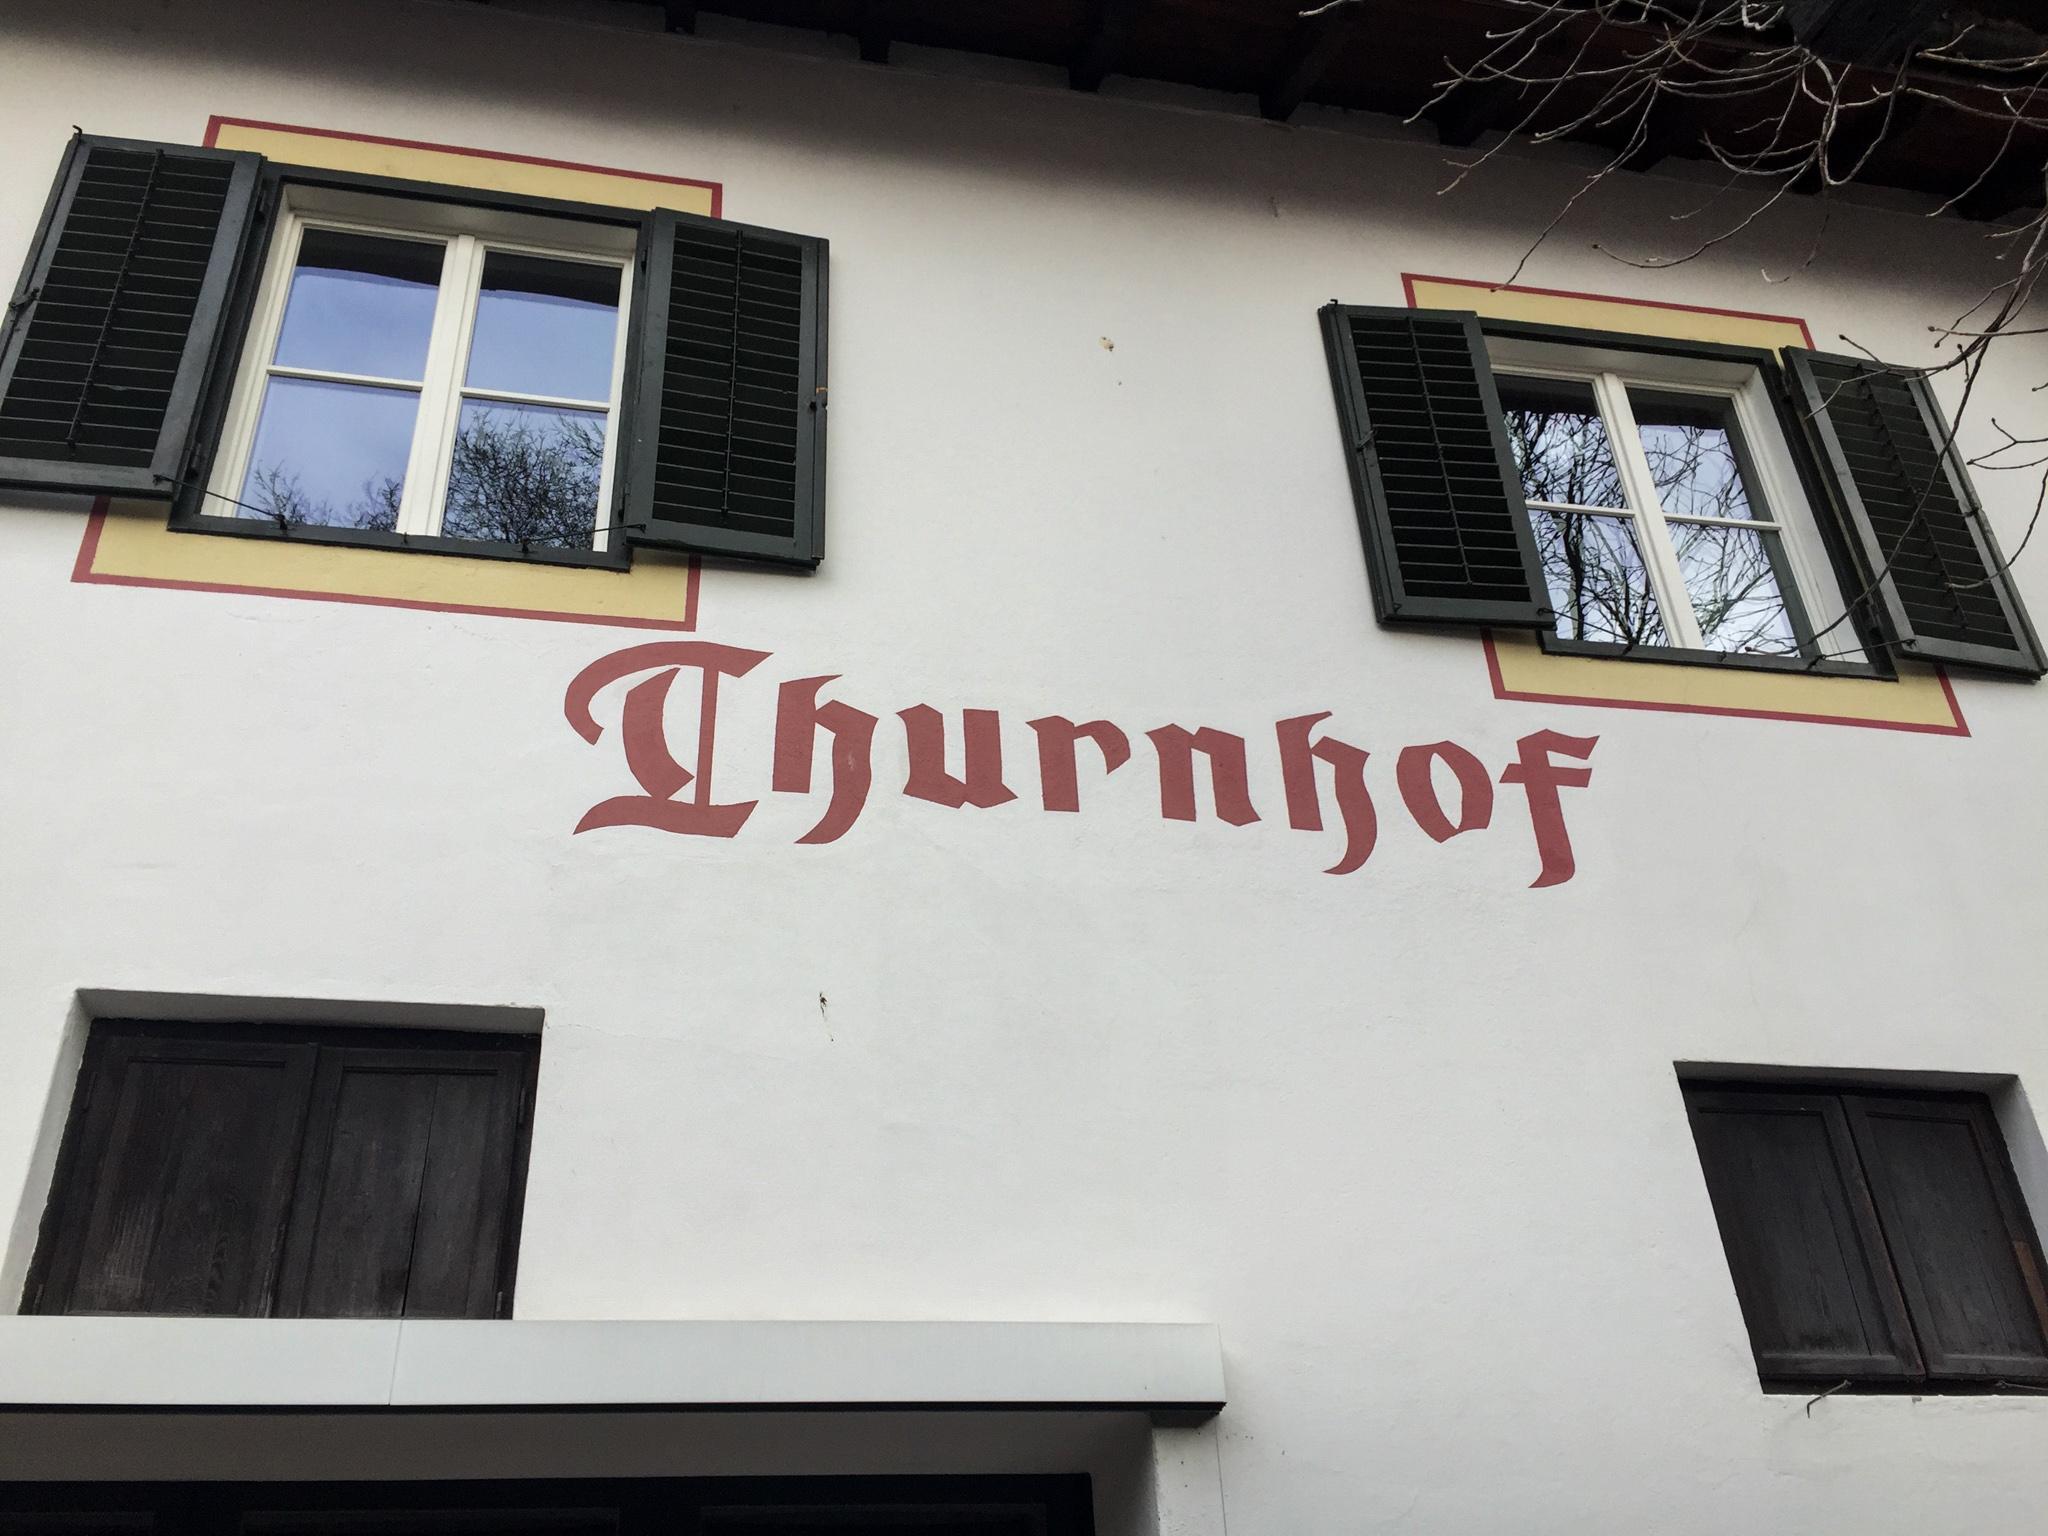 Thurnhof cellar.jpg